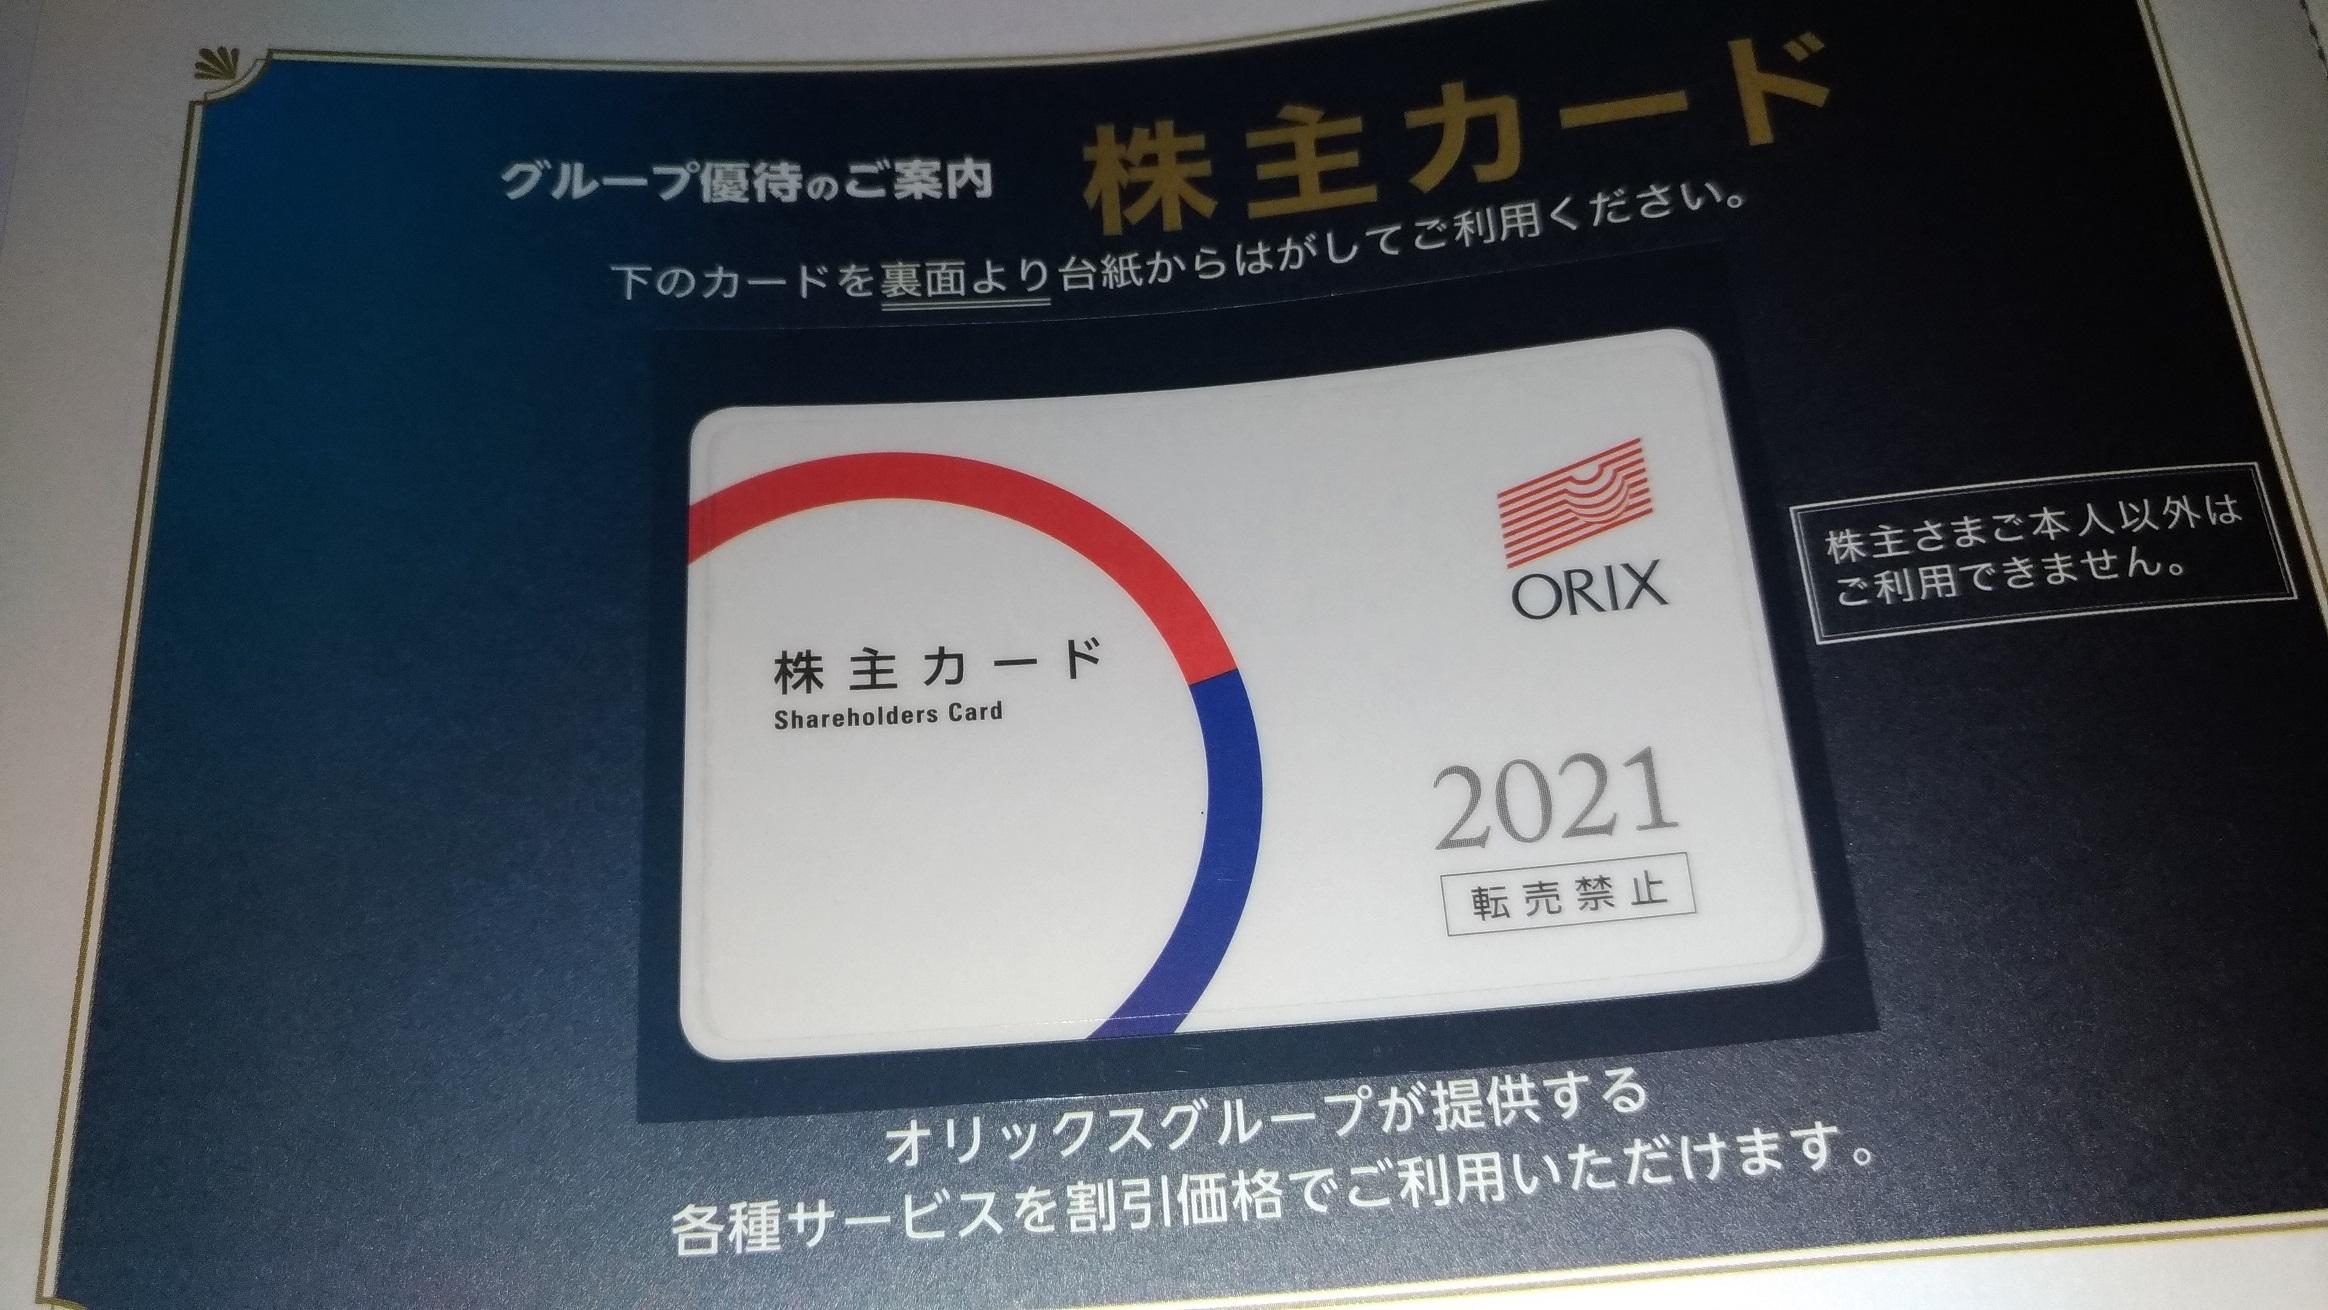 orix_2021_yutai_03_2.jpg